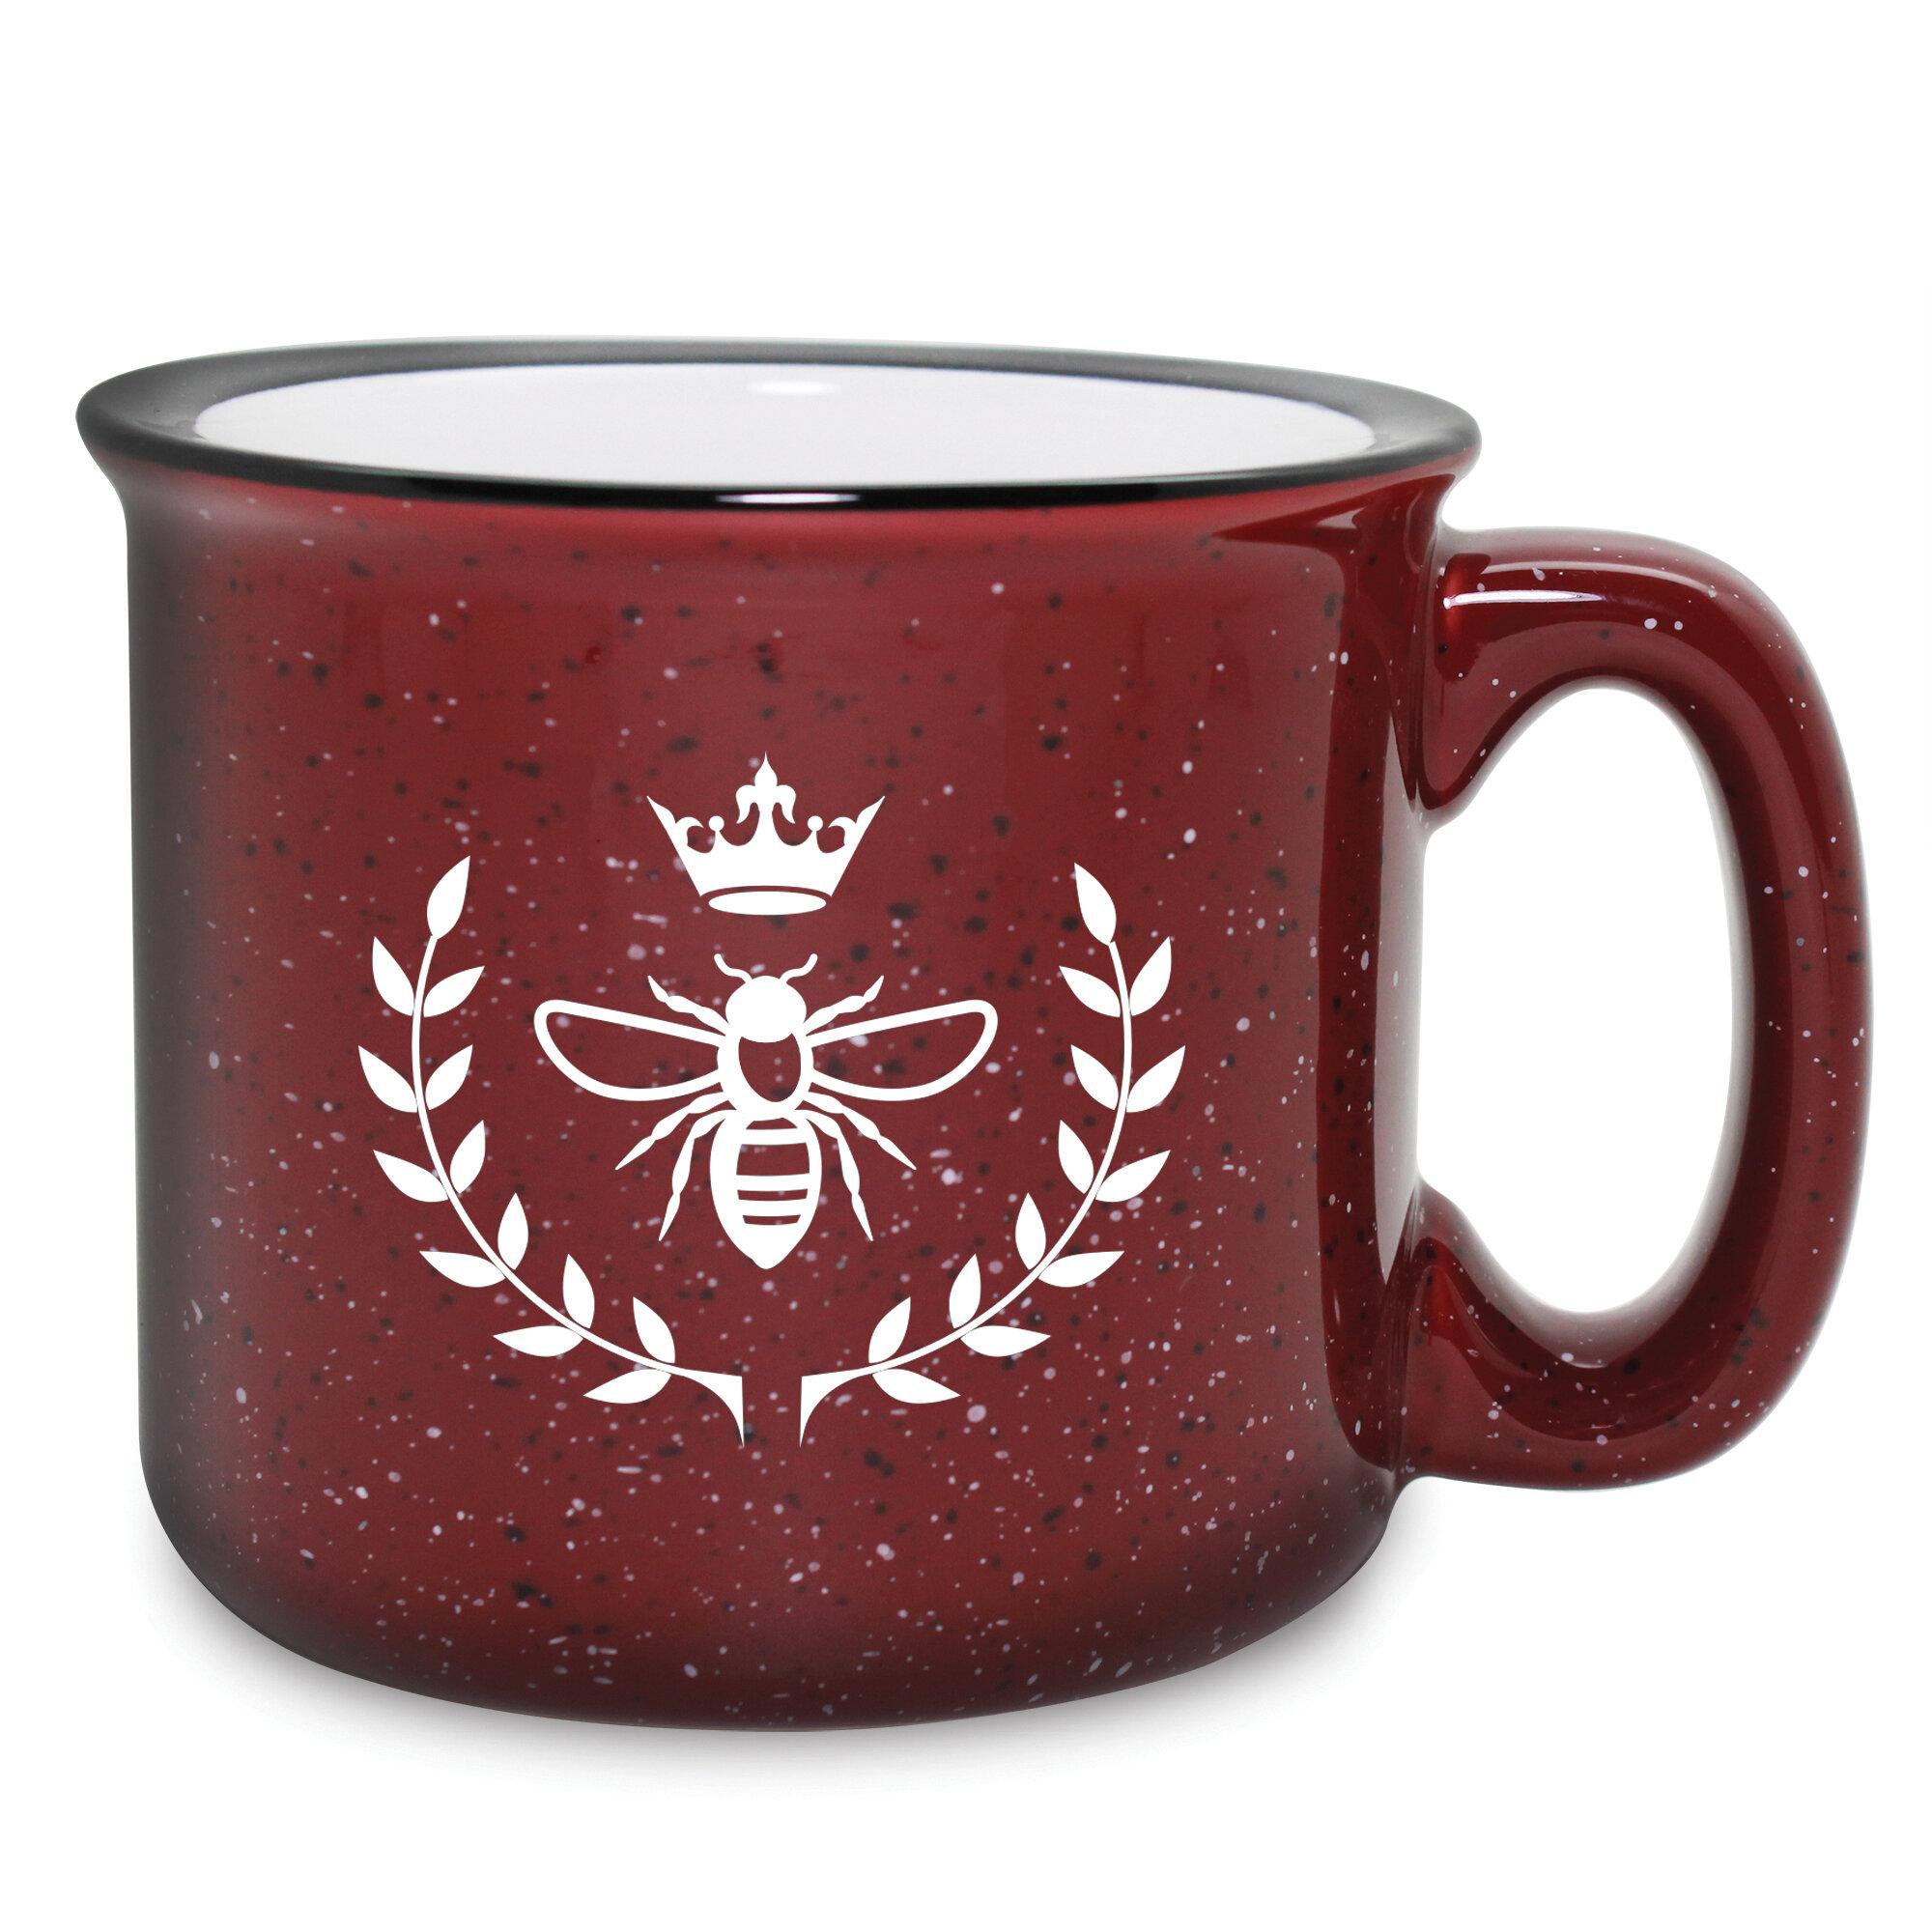 Set of 4 Mint Green 15oz Vintage Enamel-Look Ceramic Tea Coffee Latte Mugs